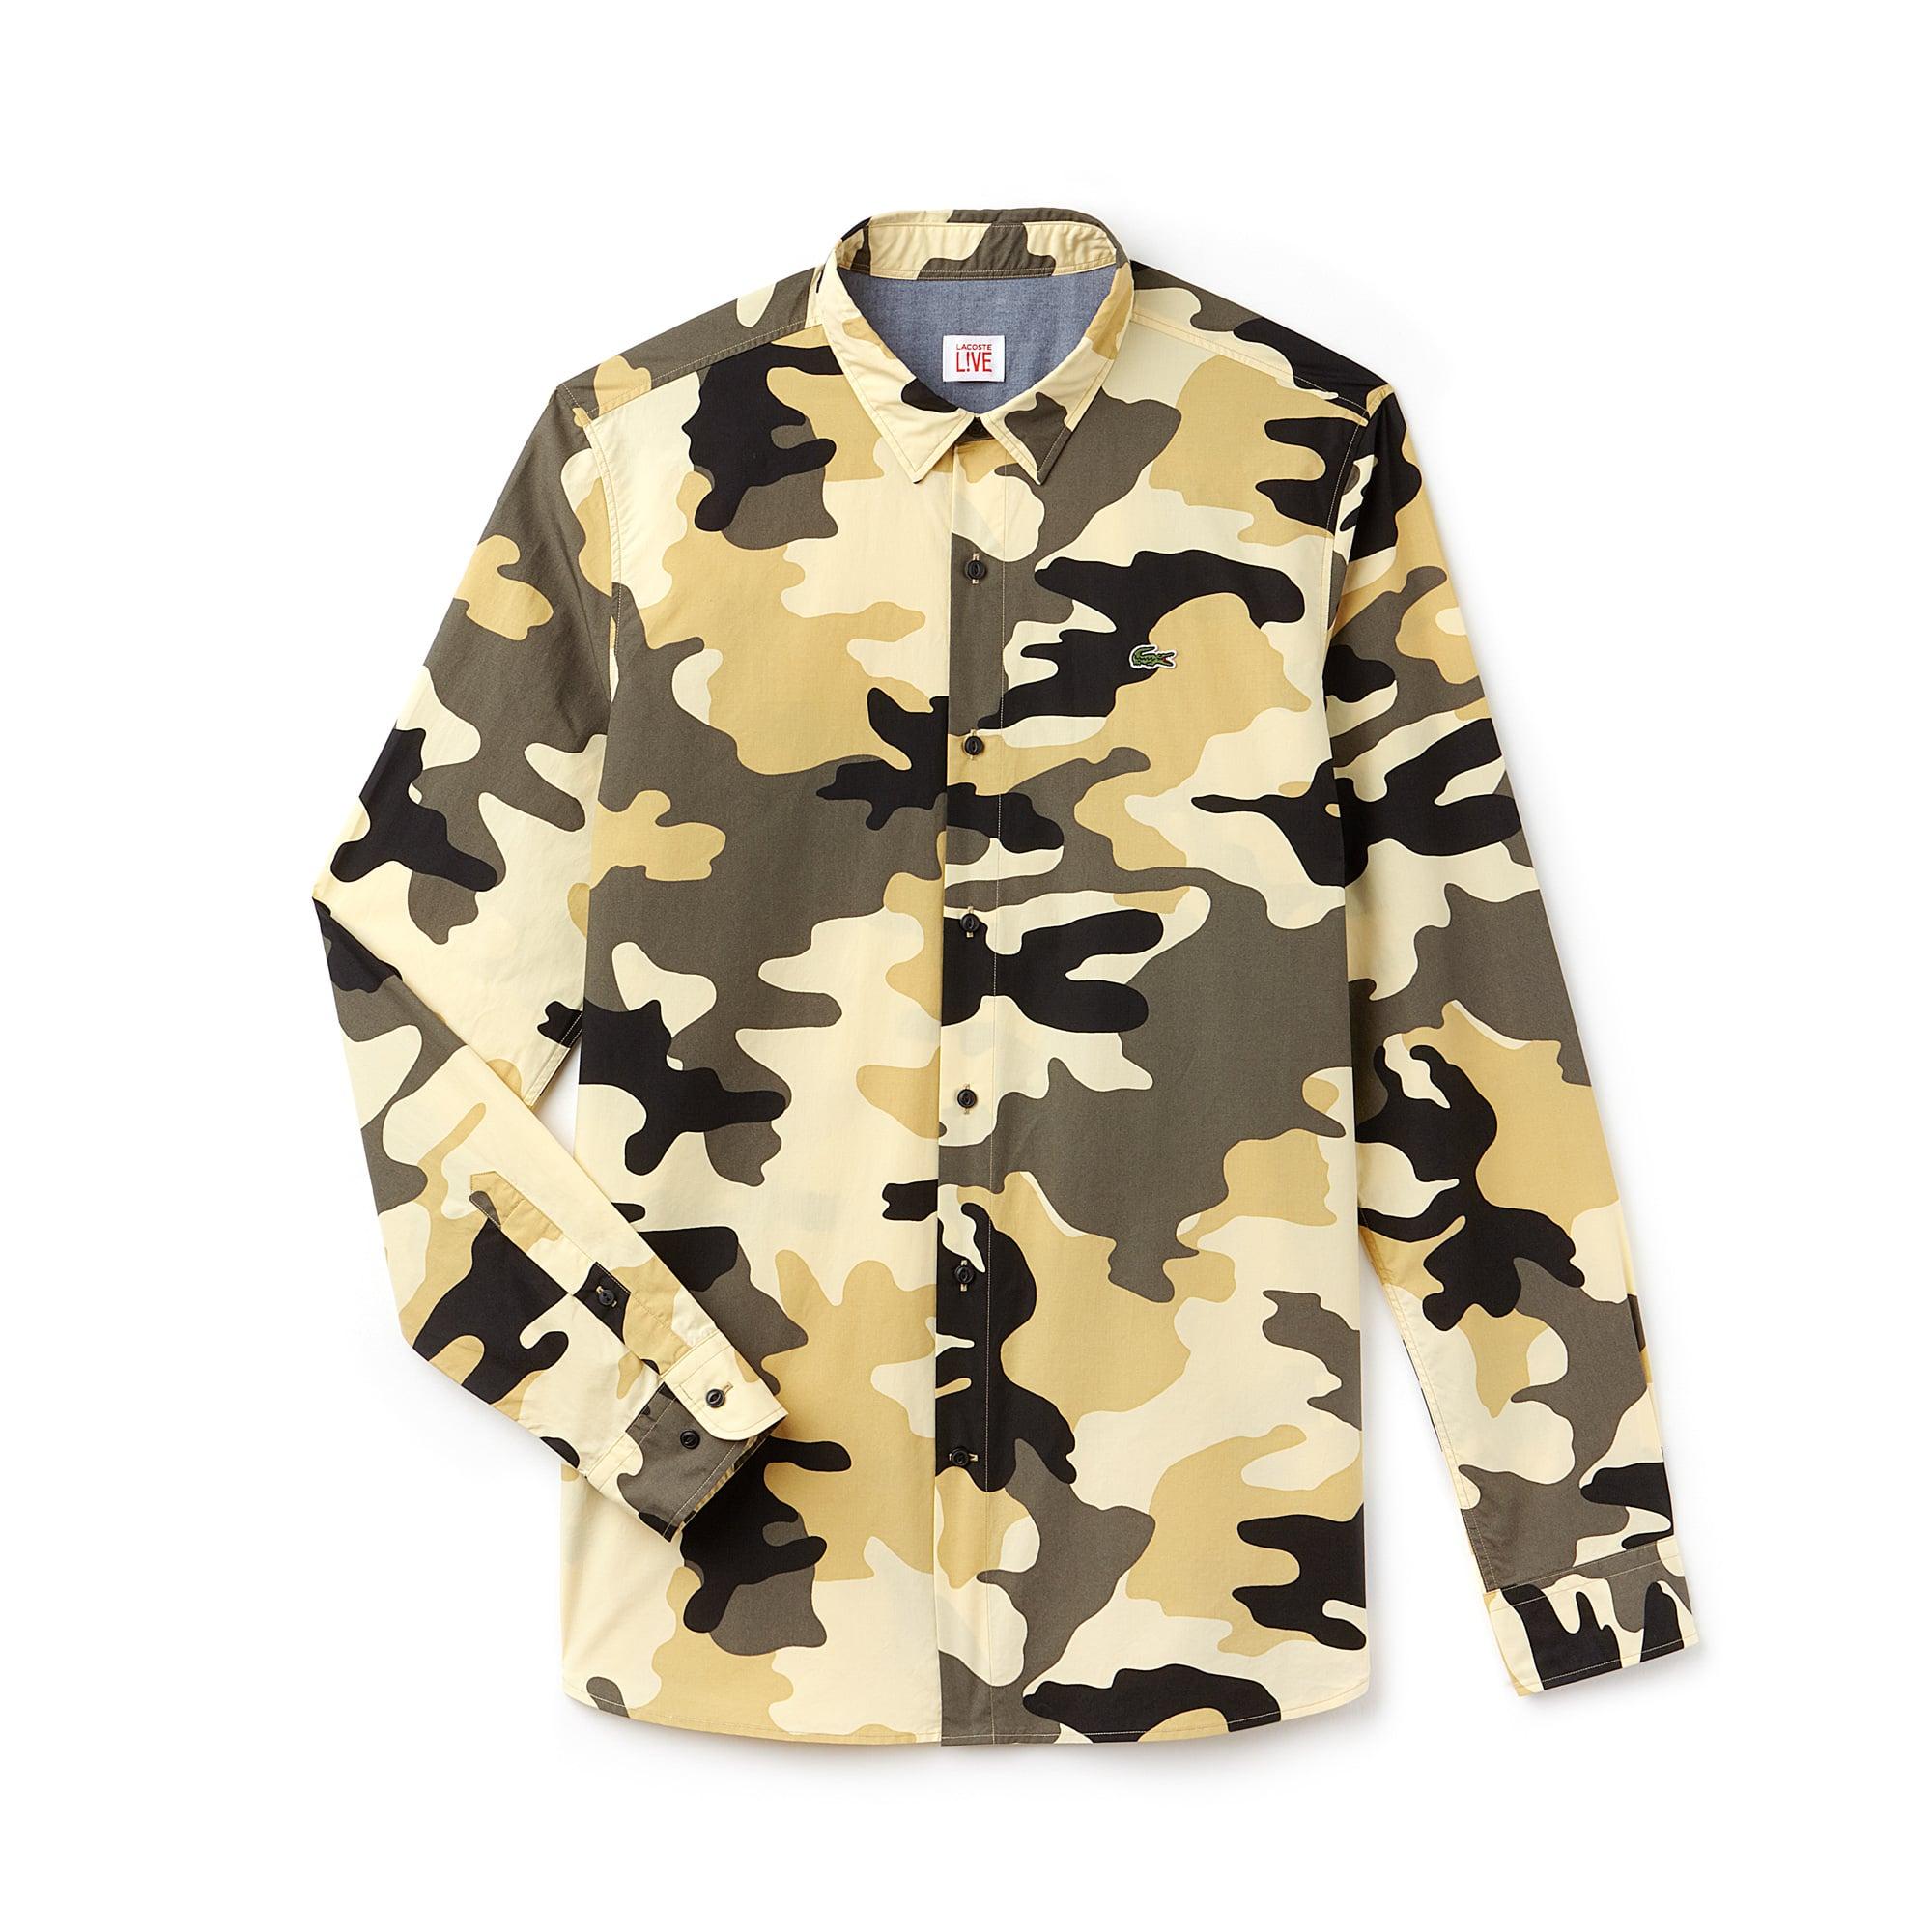 Men's Lacoste LIVE Slim Fit Camouflage Print Poplin Shirt